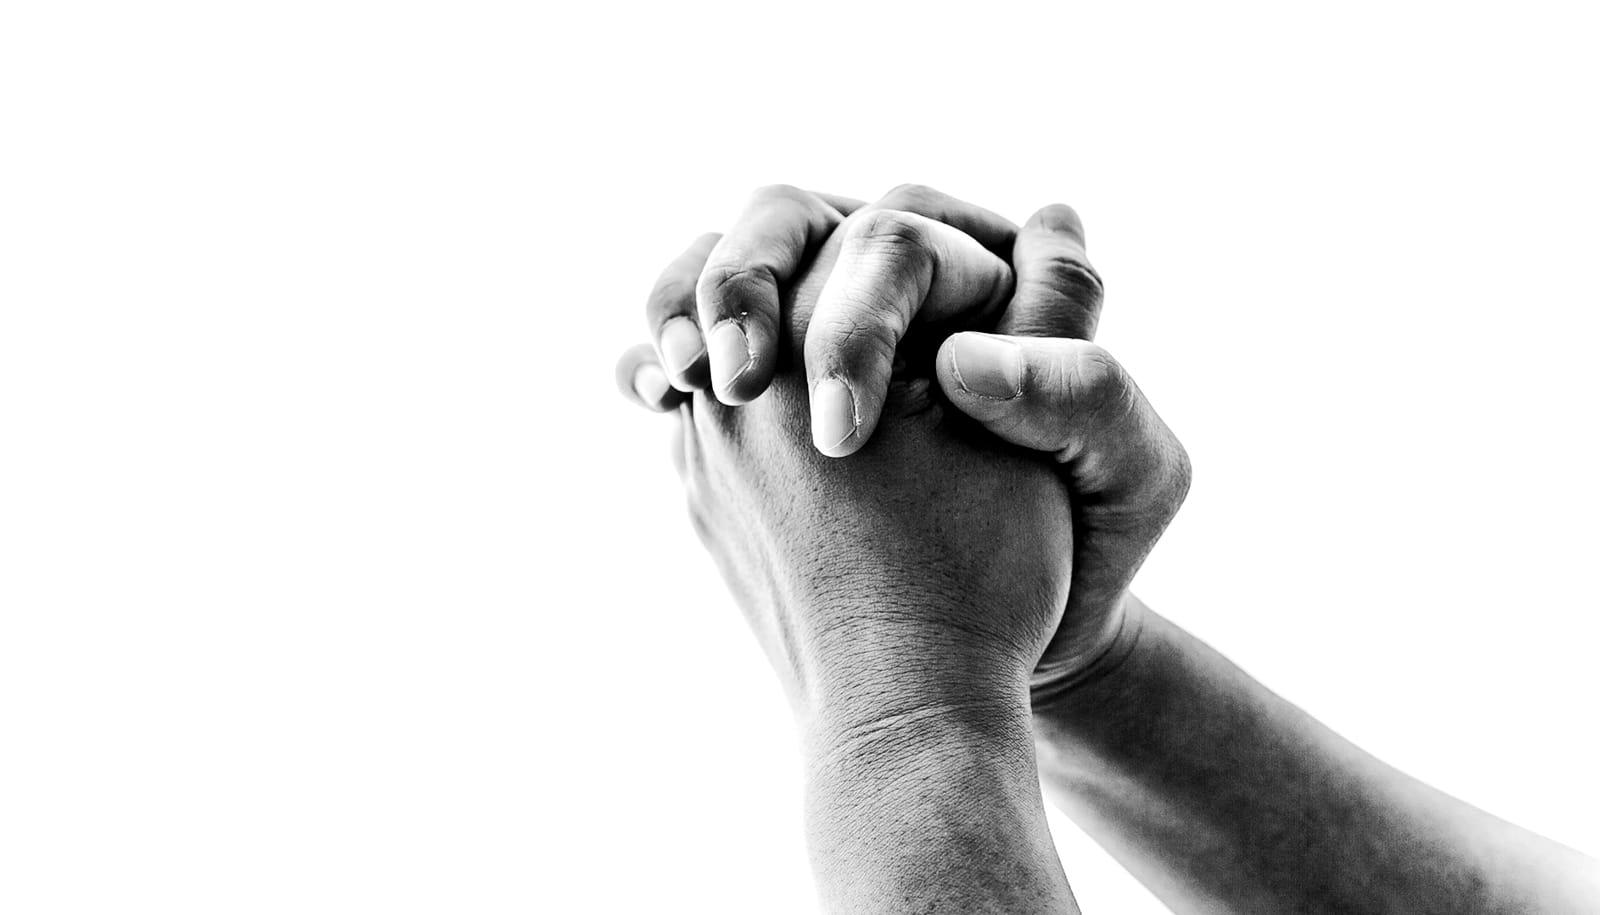 hands praying grayscale 1600 futurity